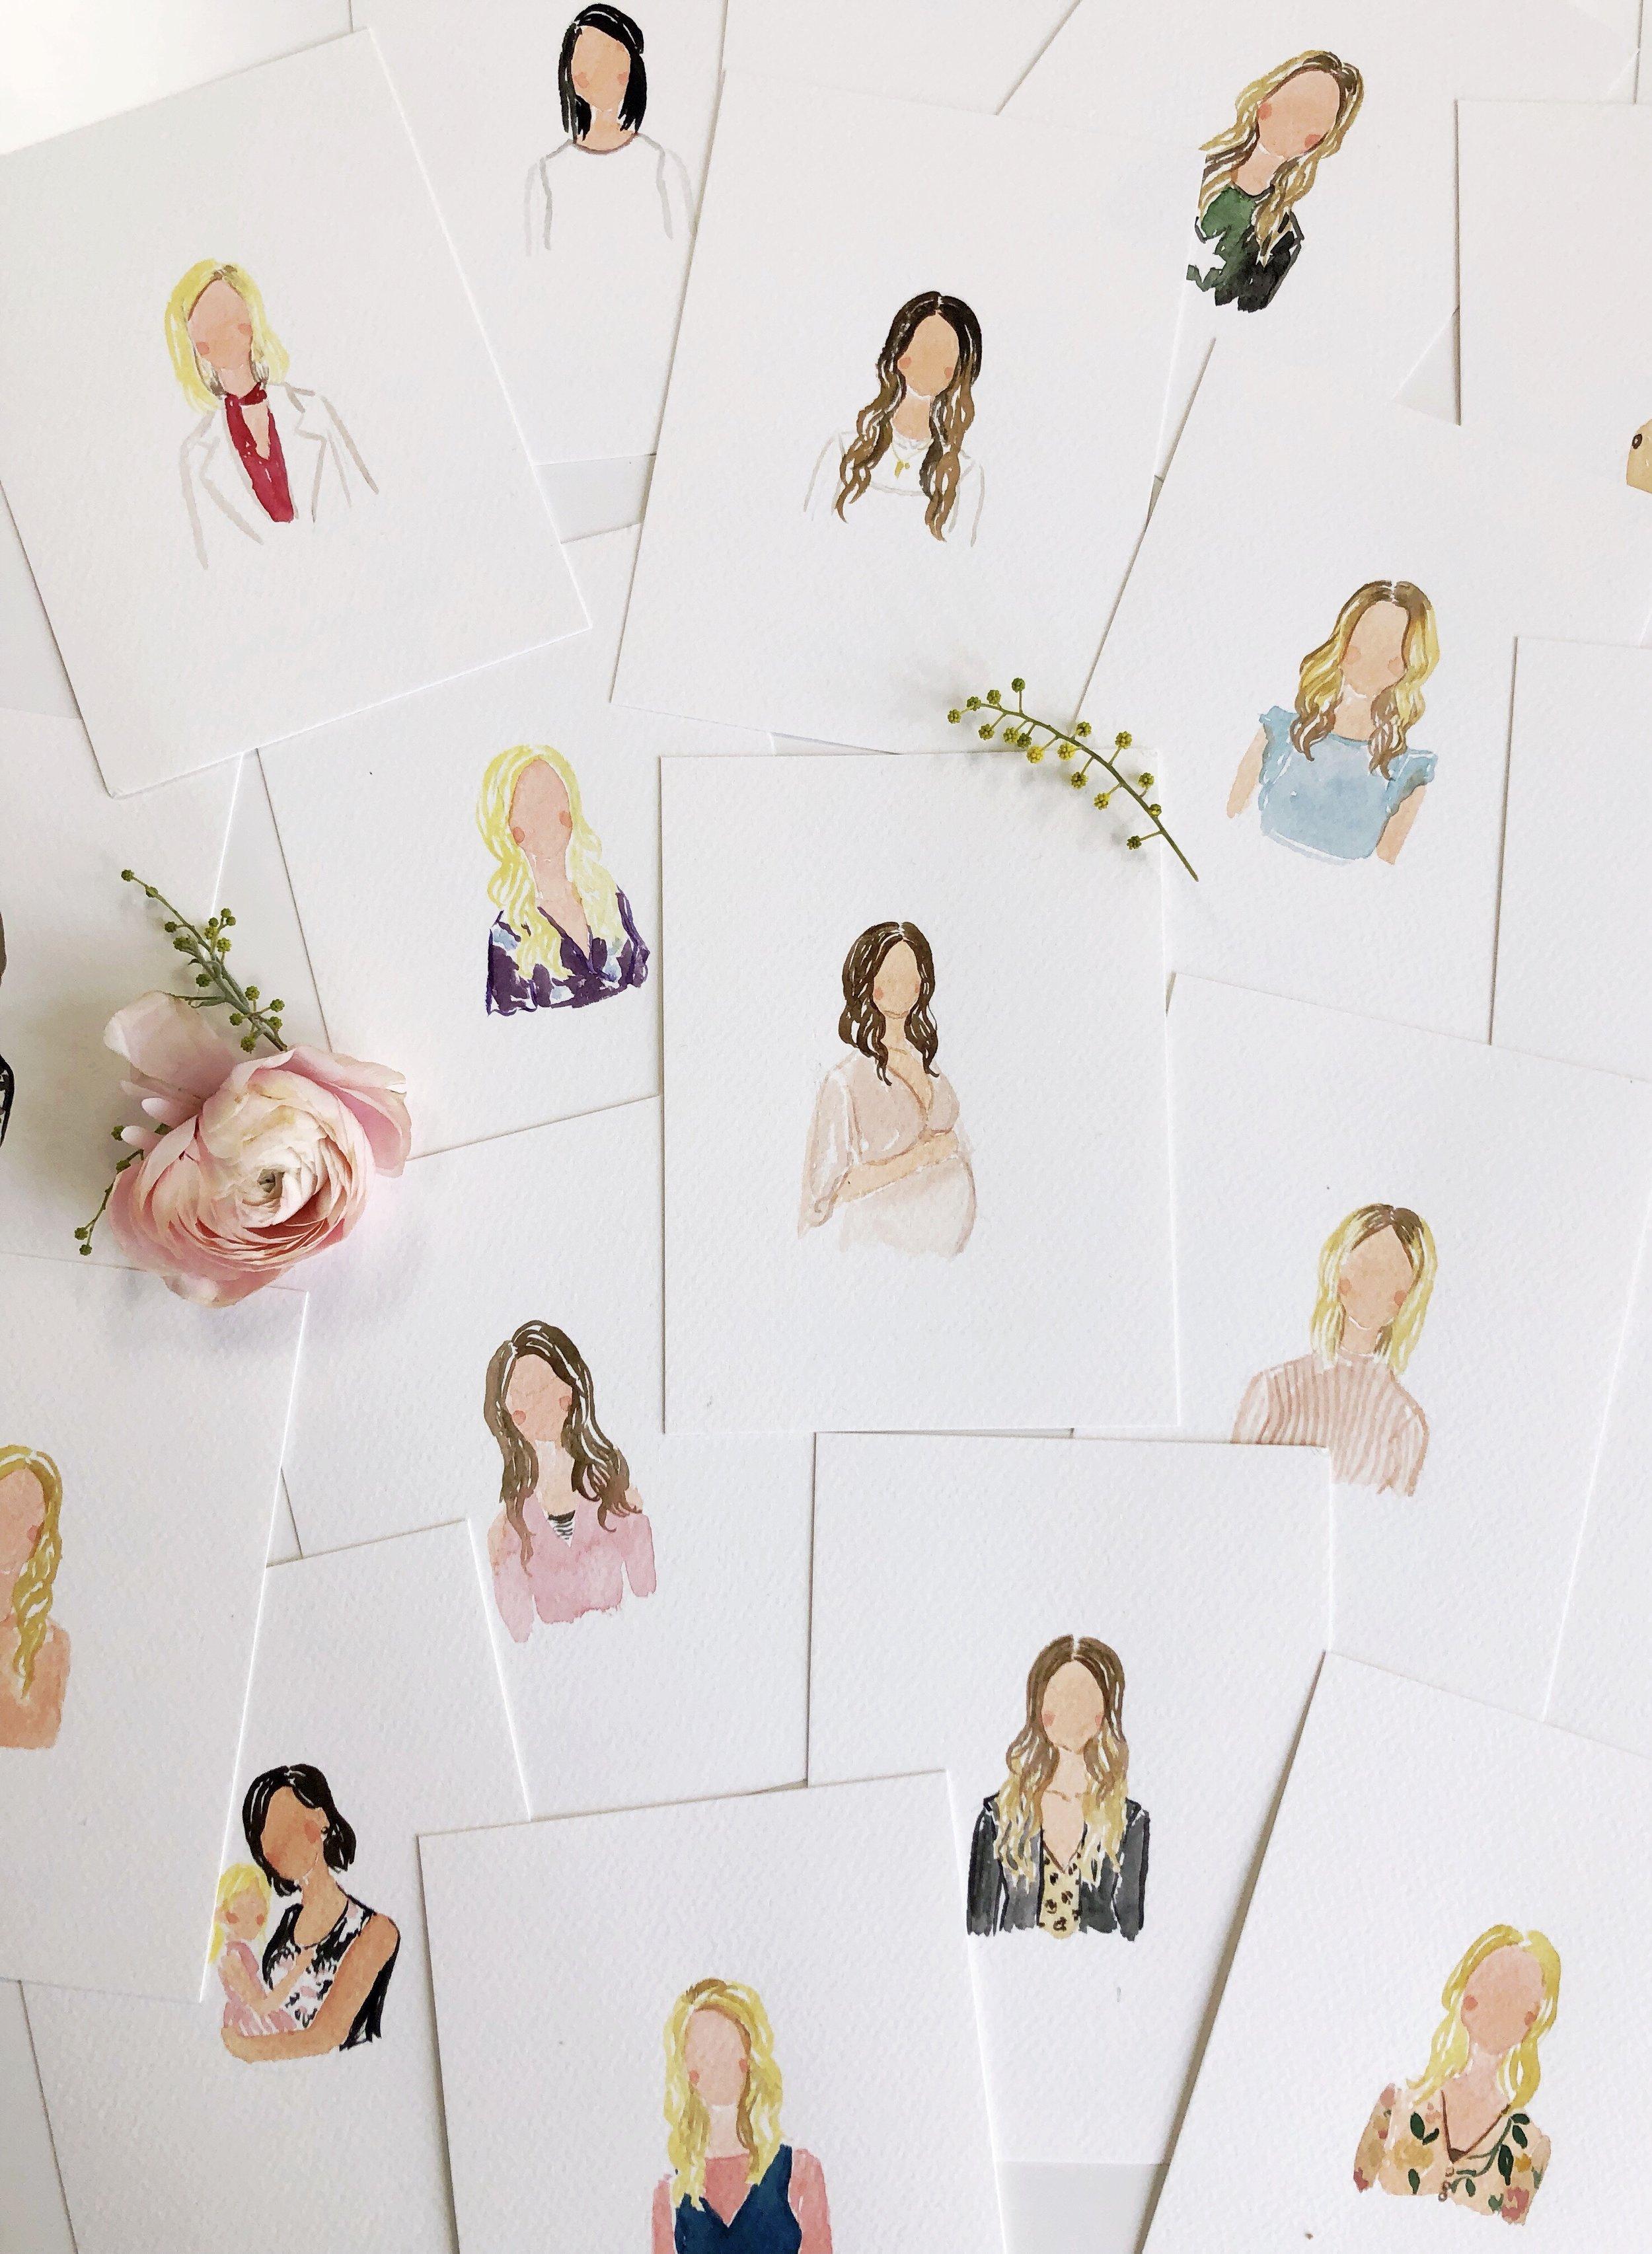 live art watercolor portrait at wedding